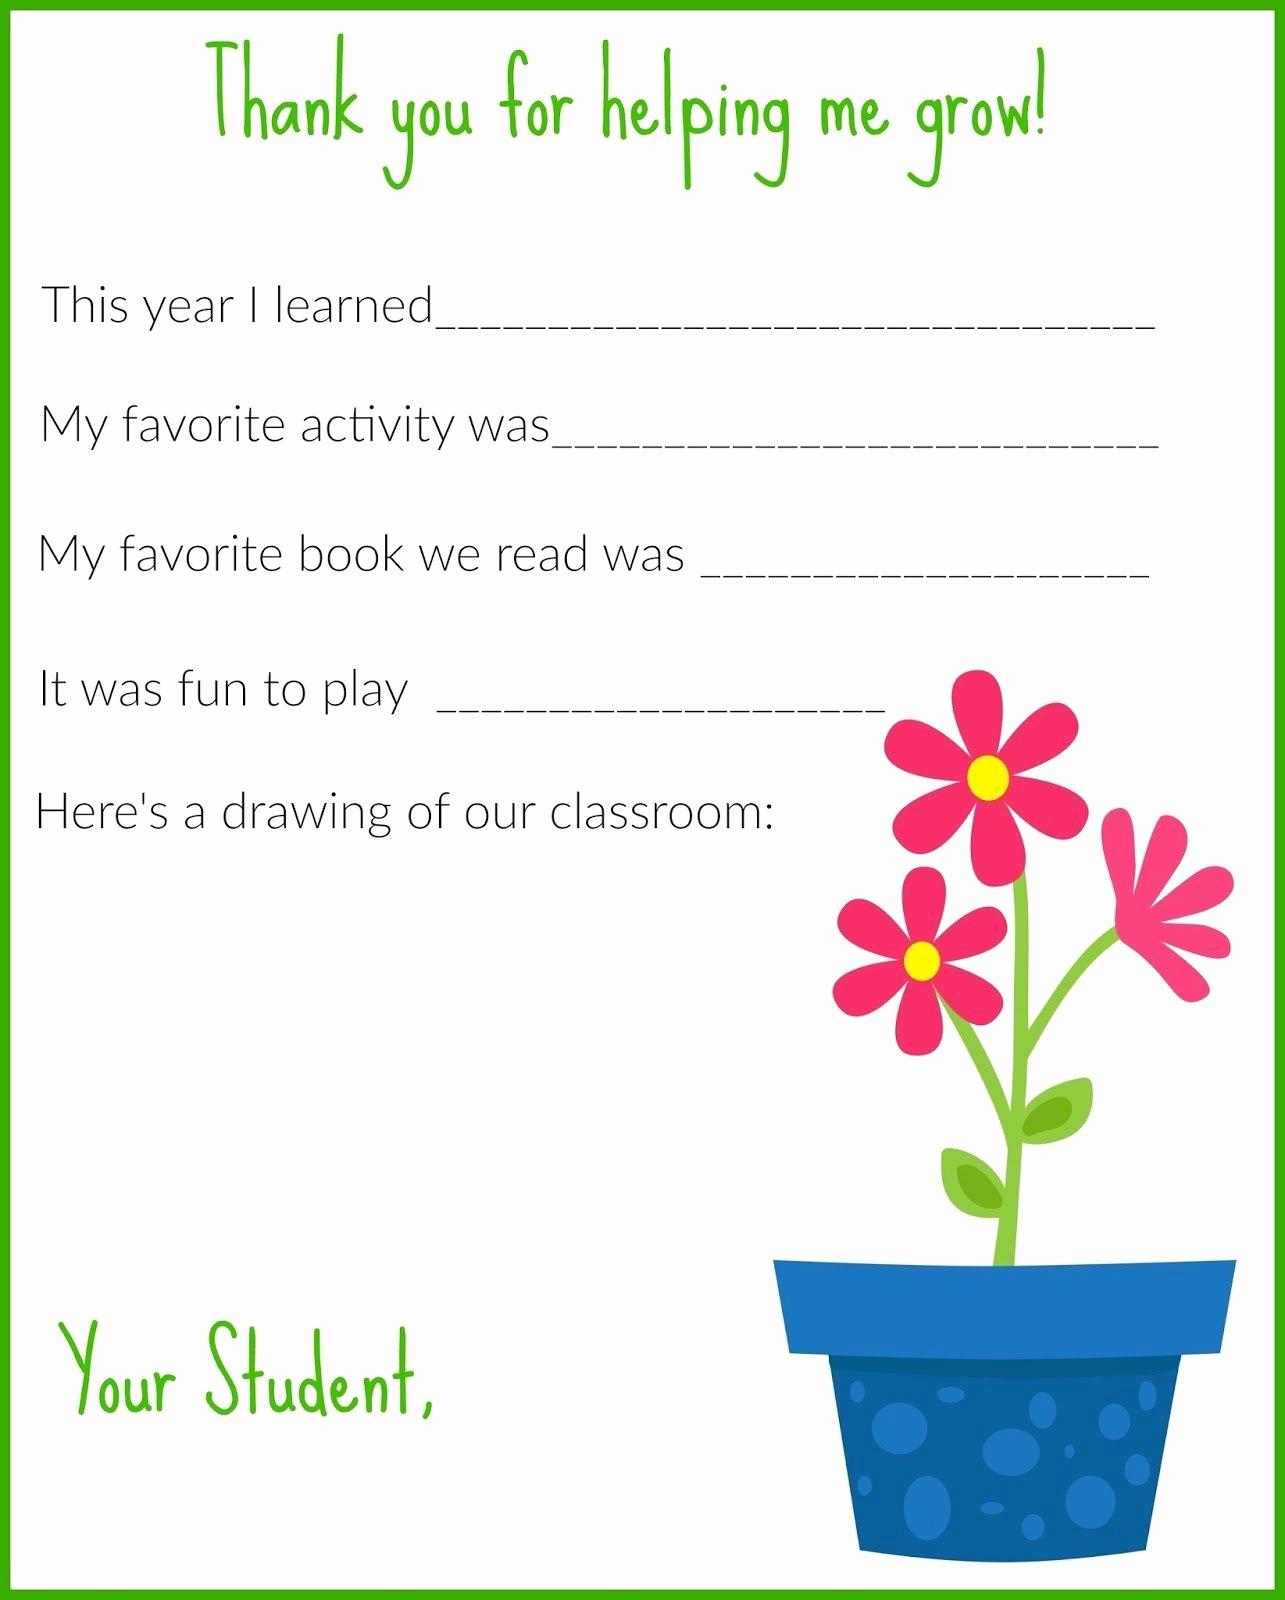 Teacher Letterhead Template Free Printable Thank You Letter Template - Free Printable Thank You Cards For Teachers